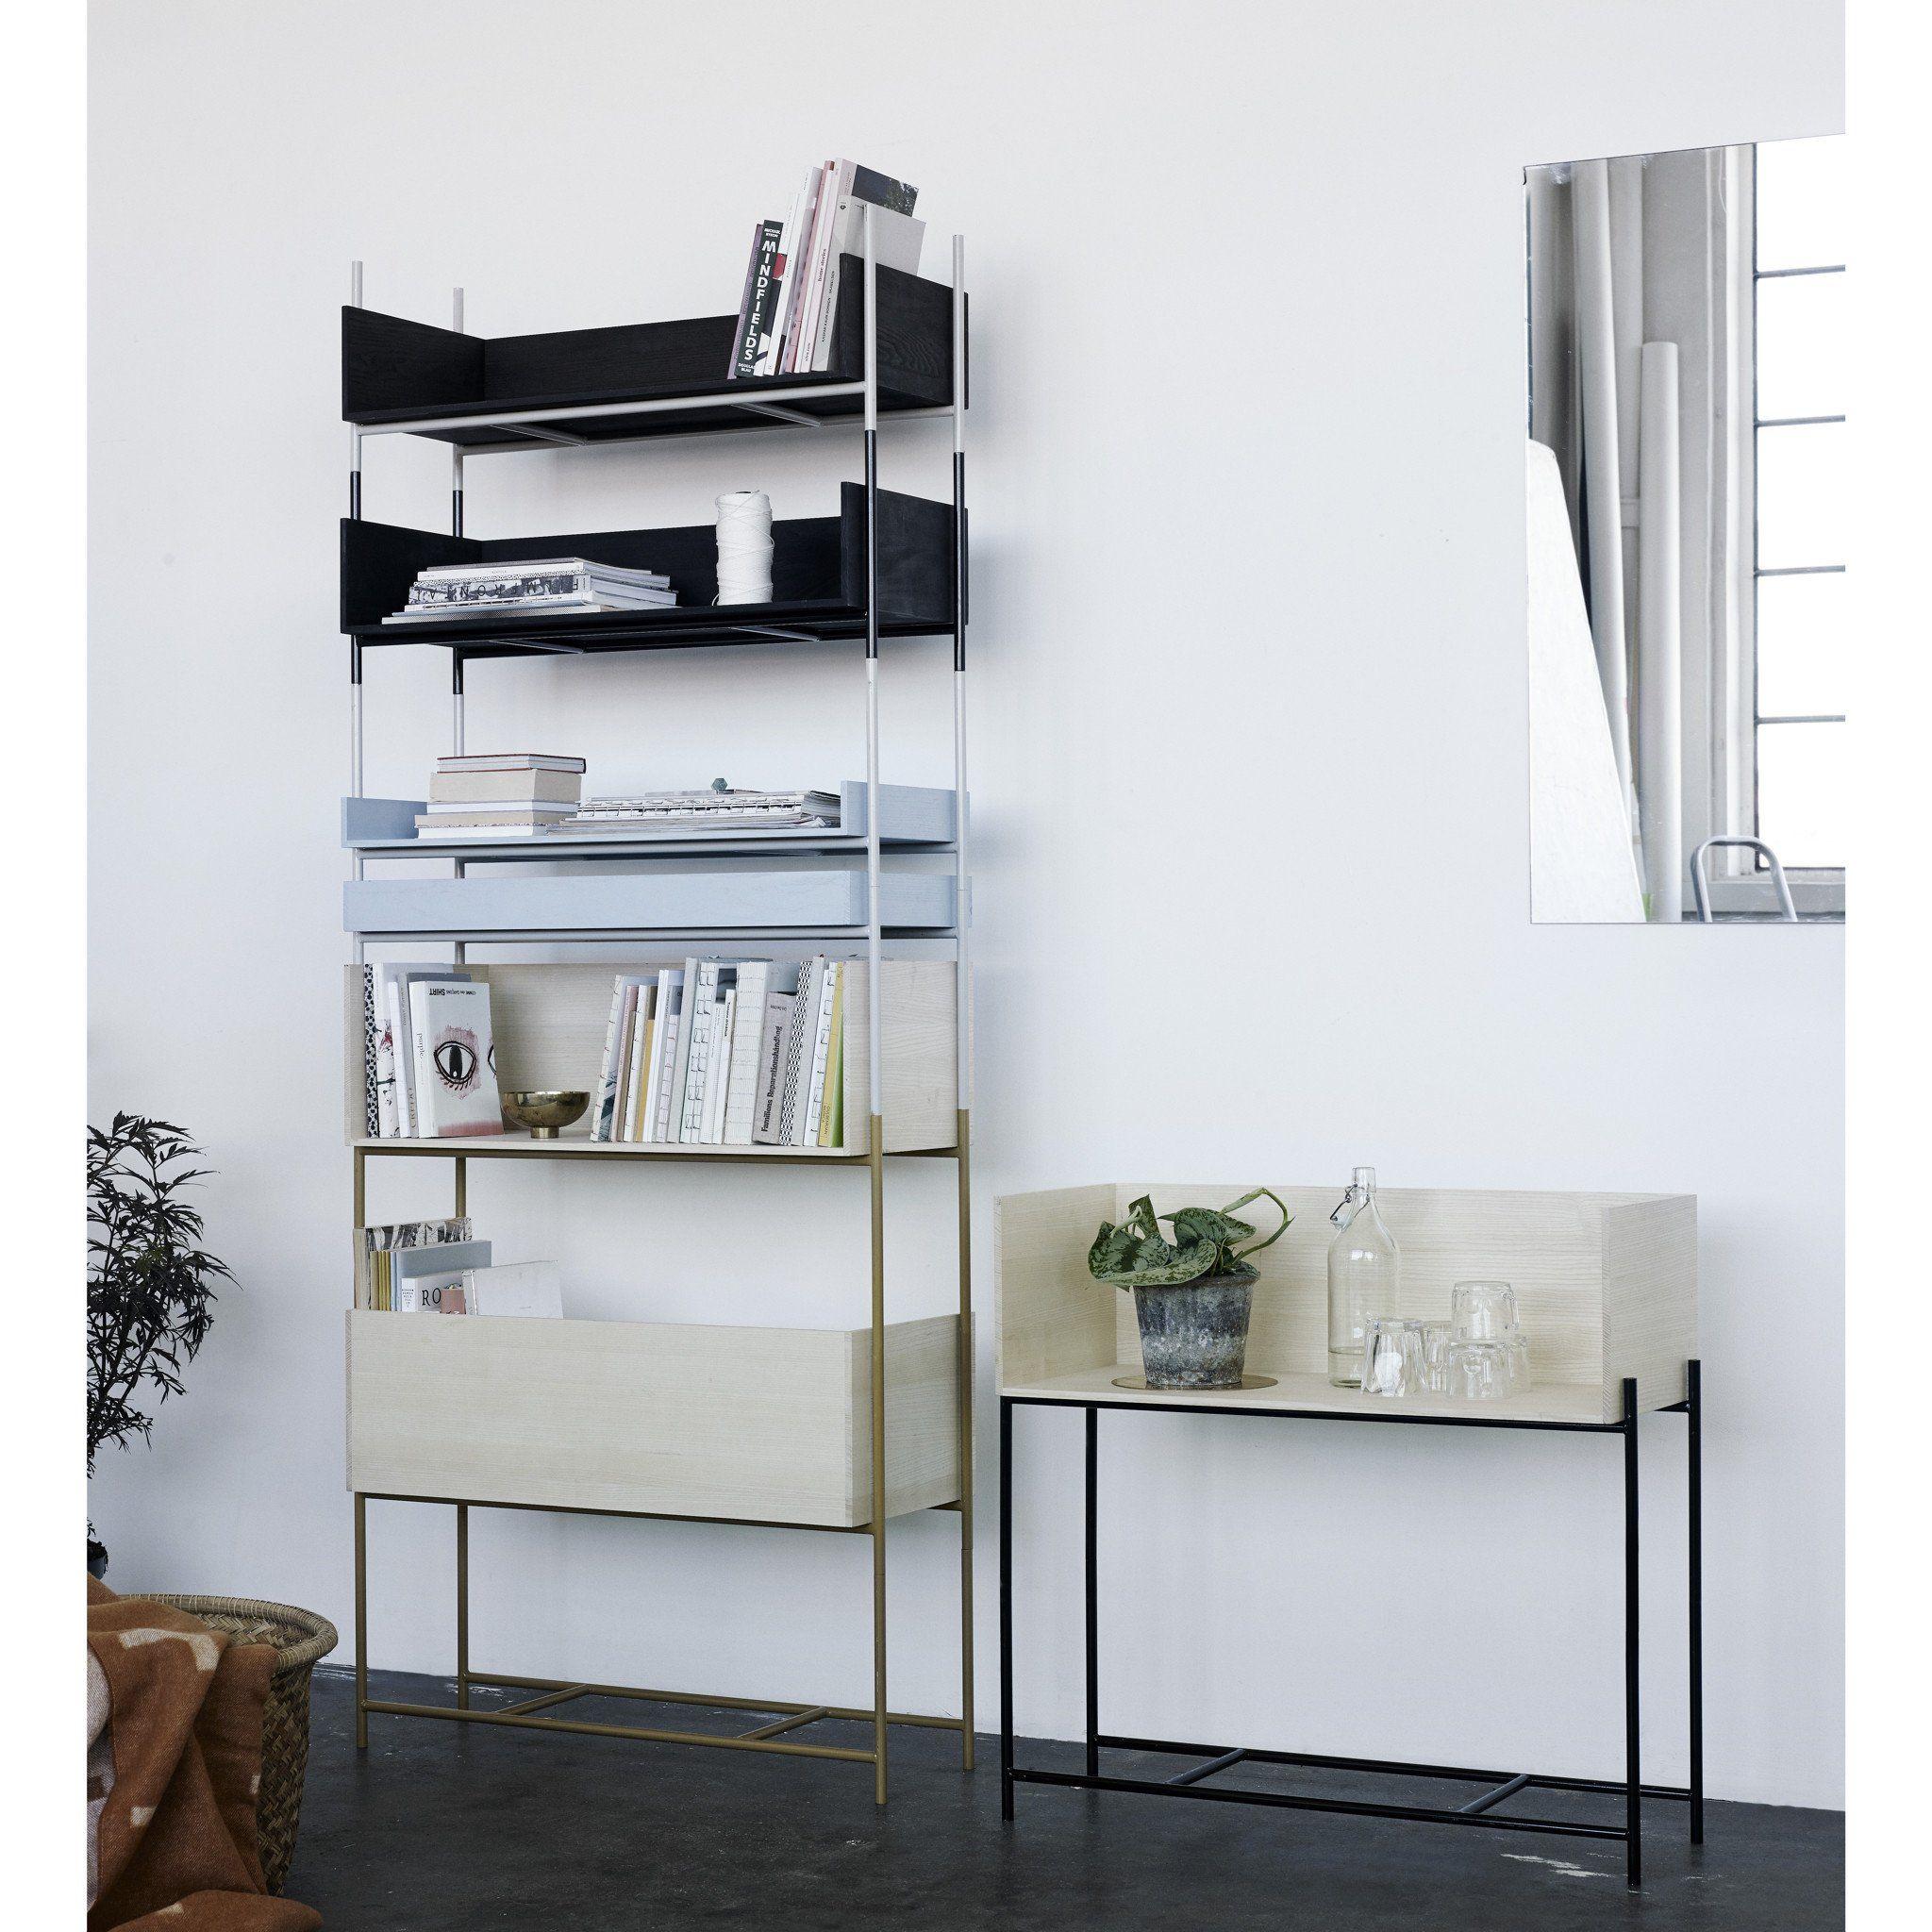 Vivlio Shelf System by Skagerak in 2020 Shelves